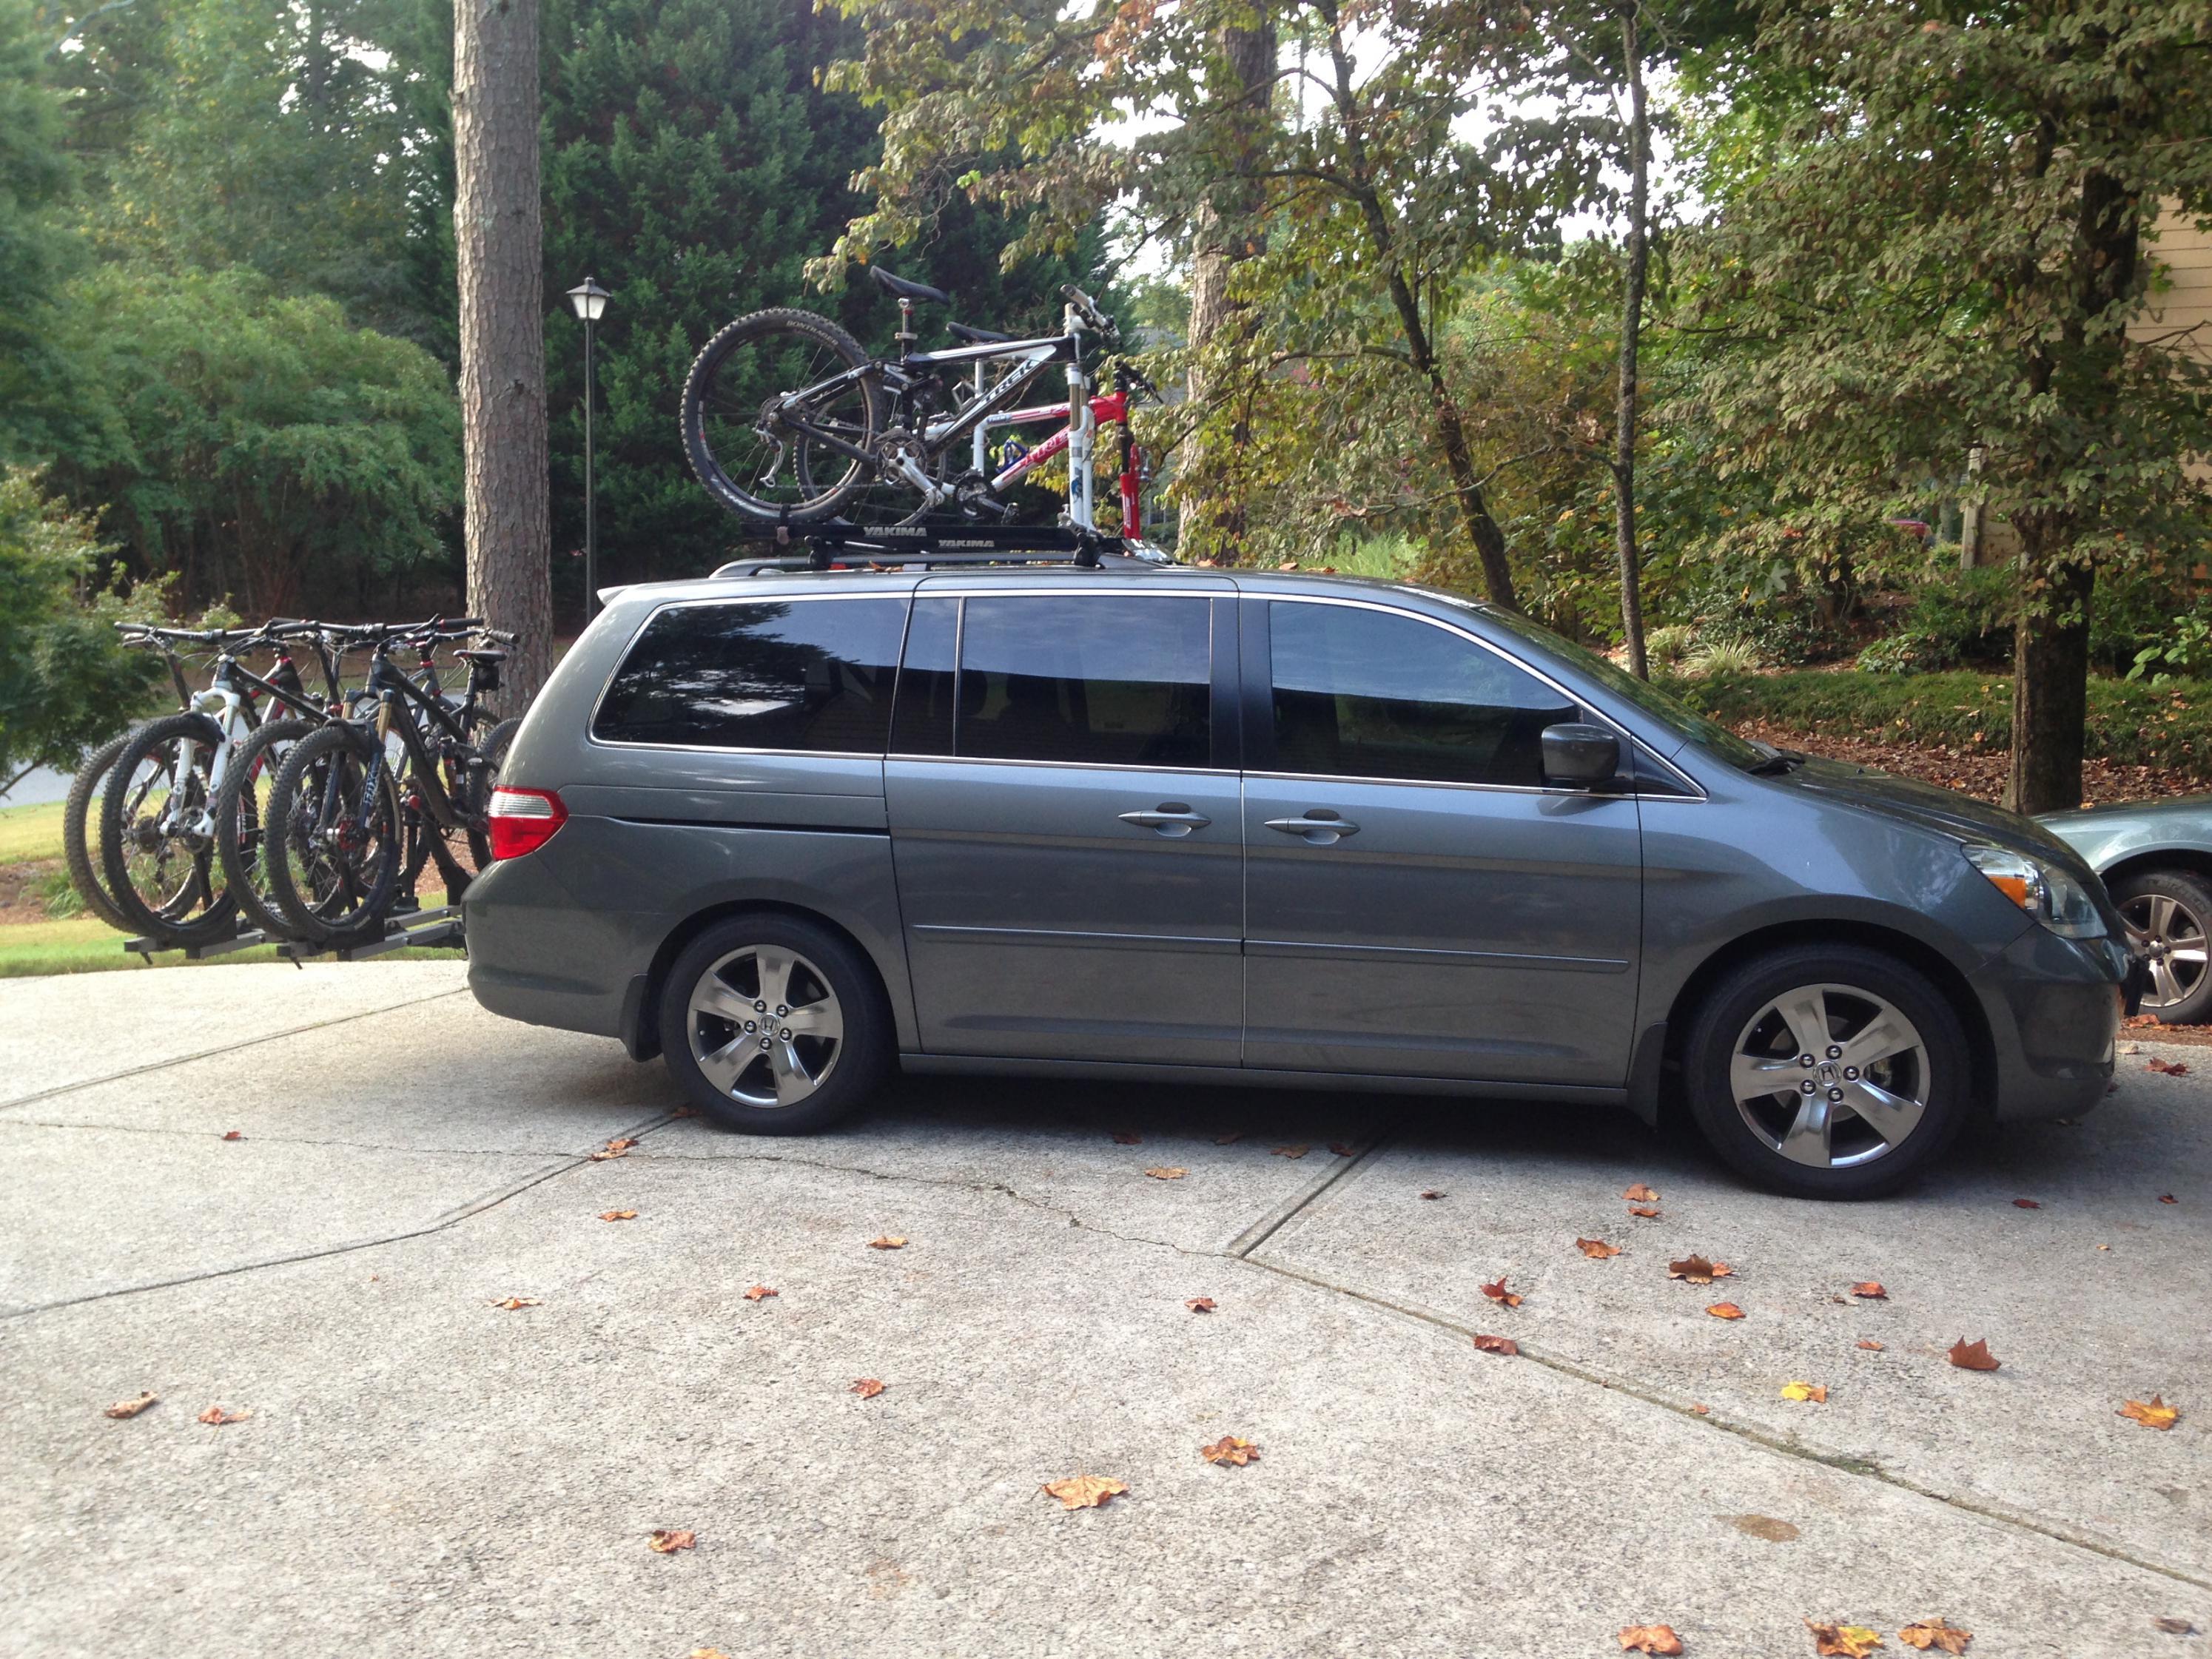 Best bike roof rack fork mount for 2015 OB Page 2 Subaru Outback